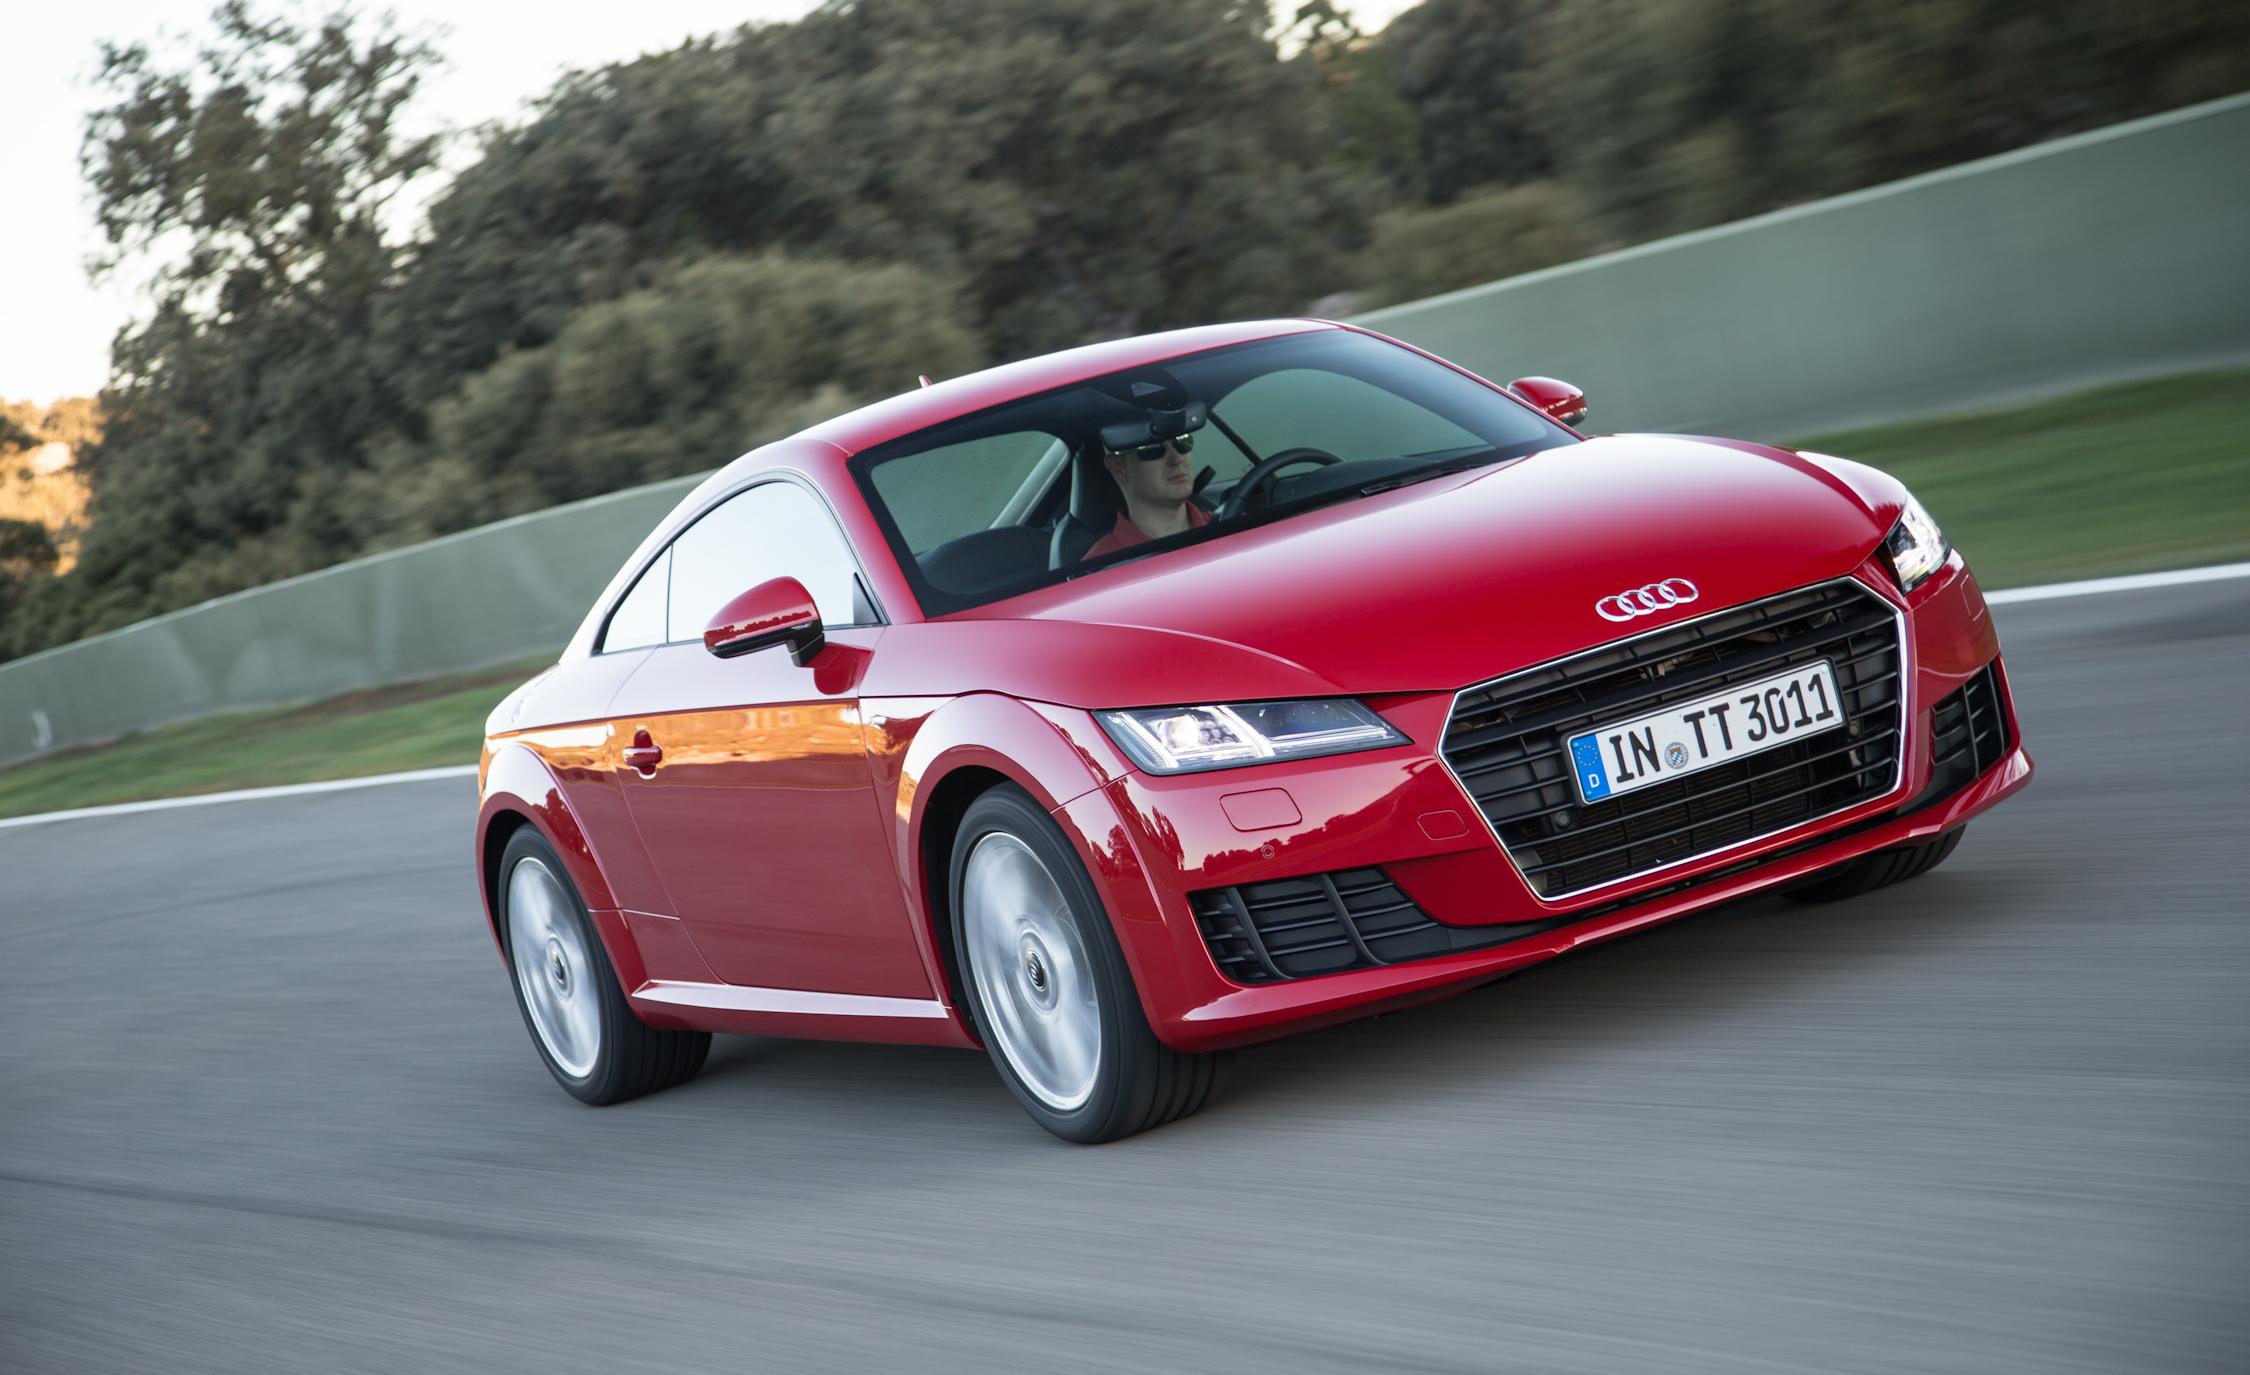 New 2016 Audi TT